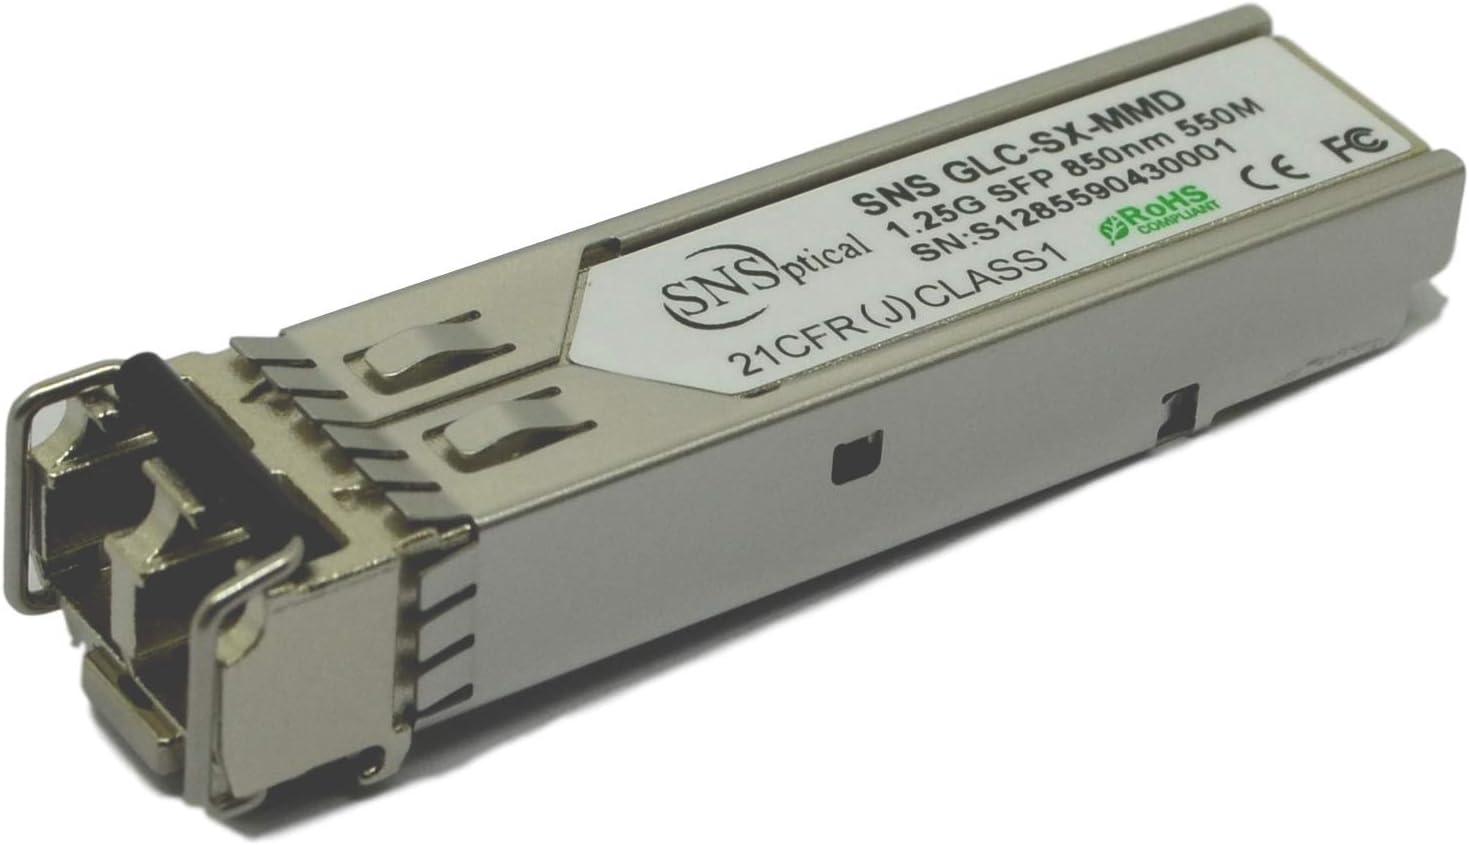 SNS SFP-GE-S Compatible with Cisco SFP-GE-S 1000BASE-SX SFP 850nm 550m EXT DDM Transceiver Module